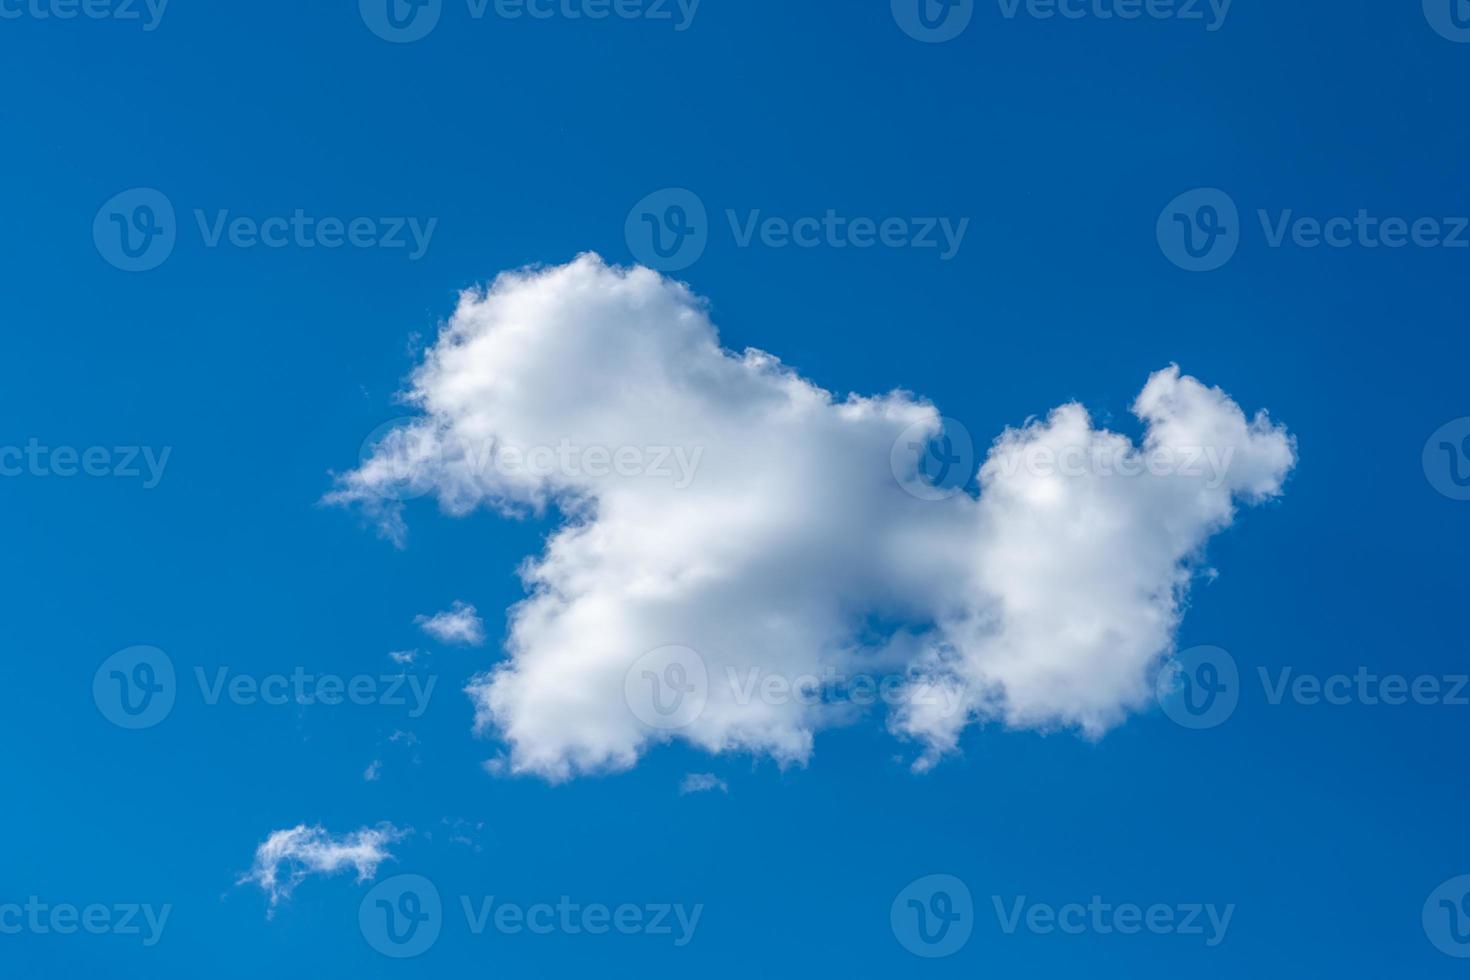 nuvola bianca alla luce del sole su un cielo estivo blu foto